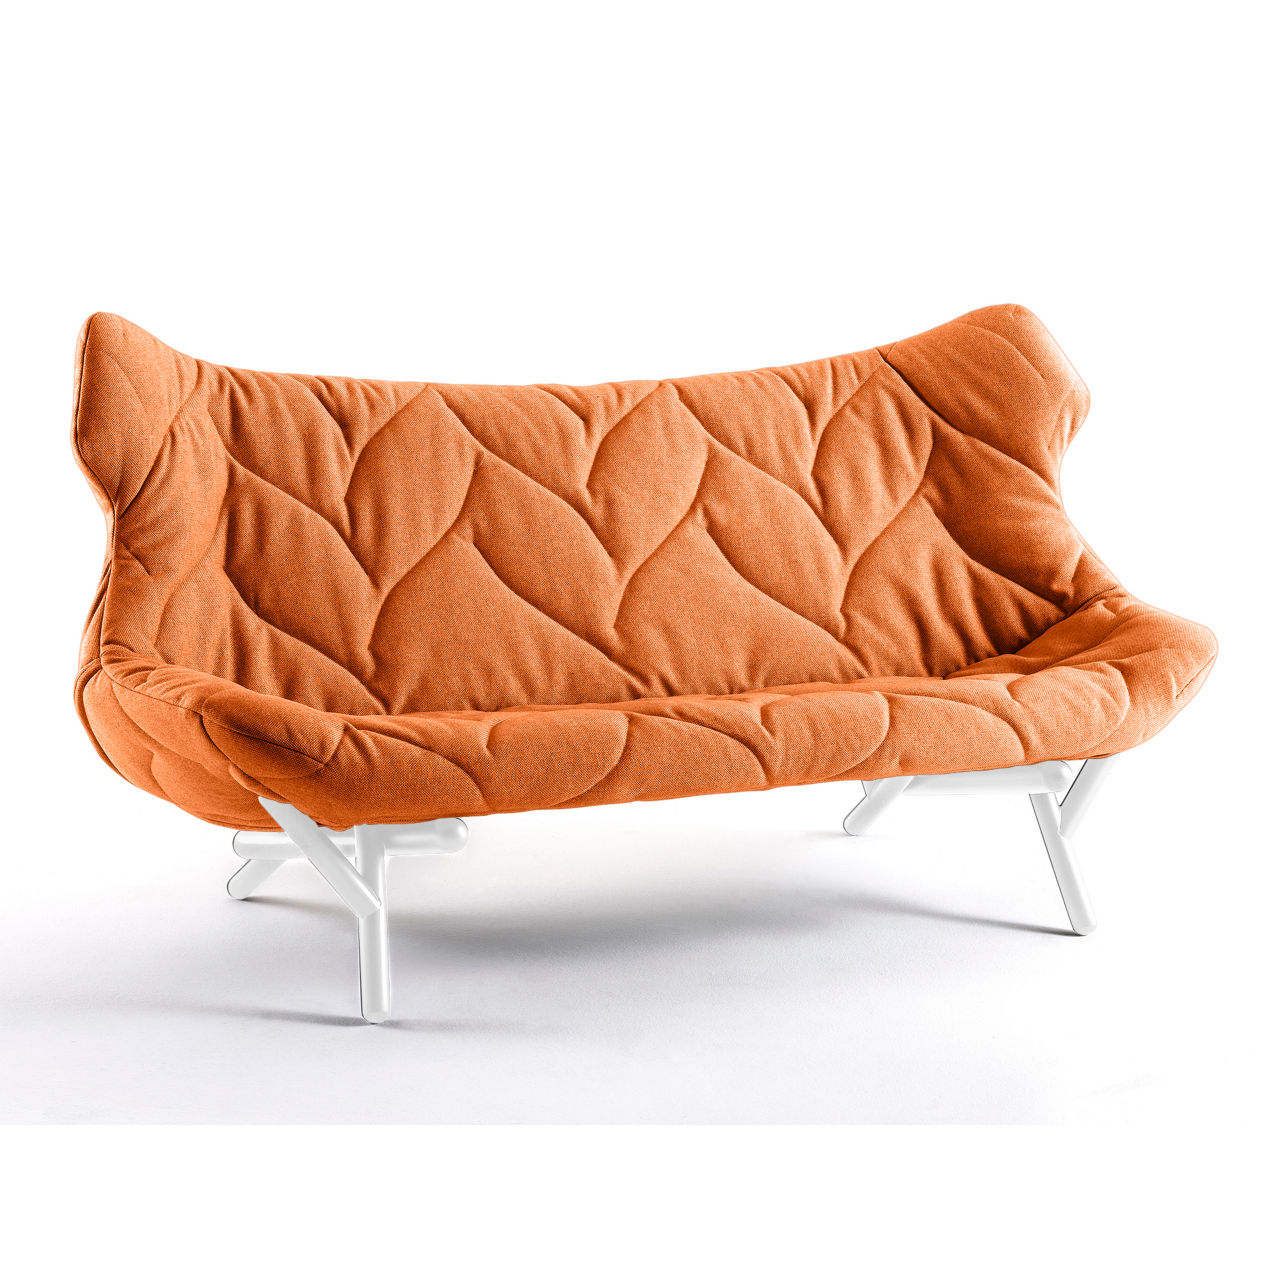 Foliage Sofa in Orange by Kartell